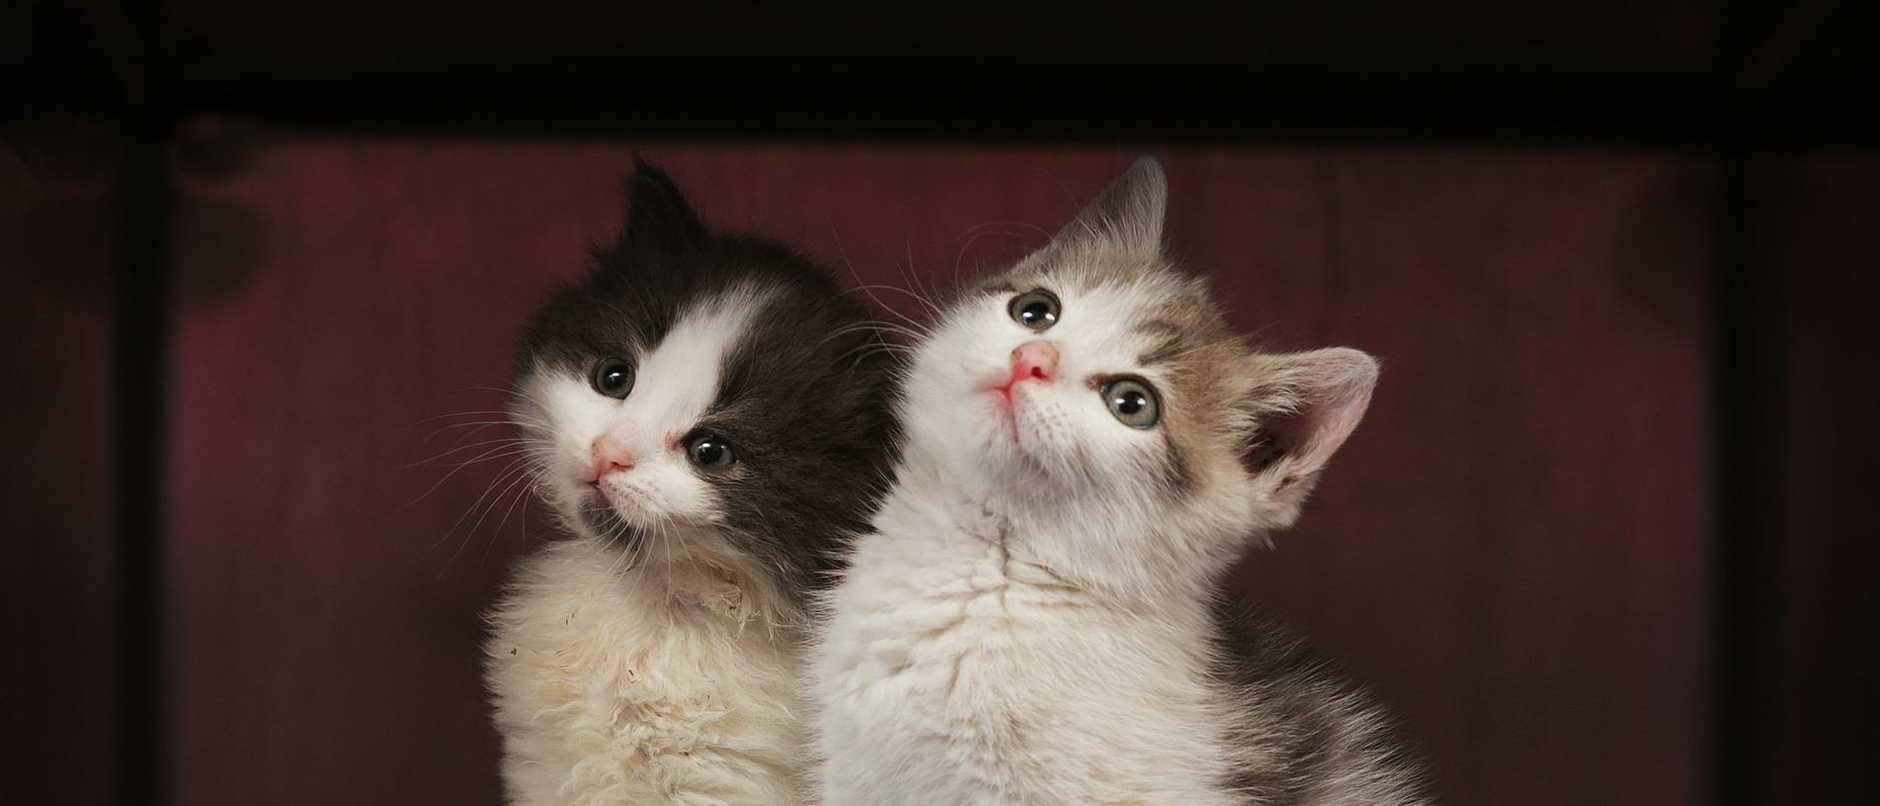 RSPCA New Kitten Nursery